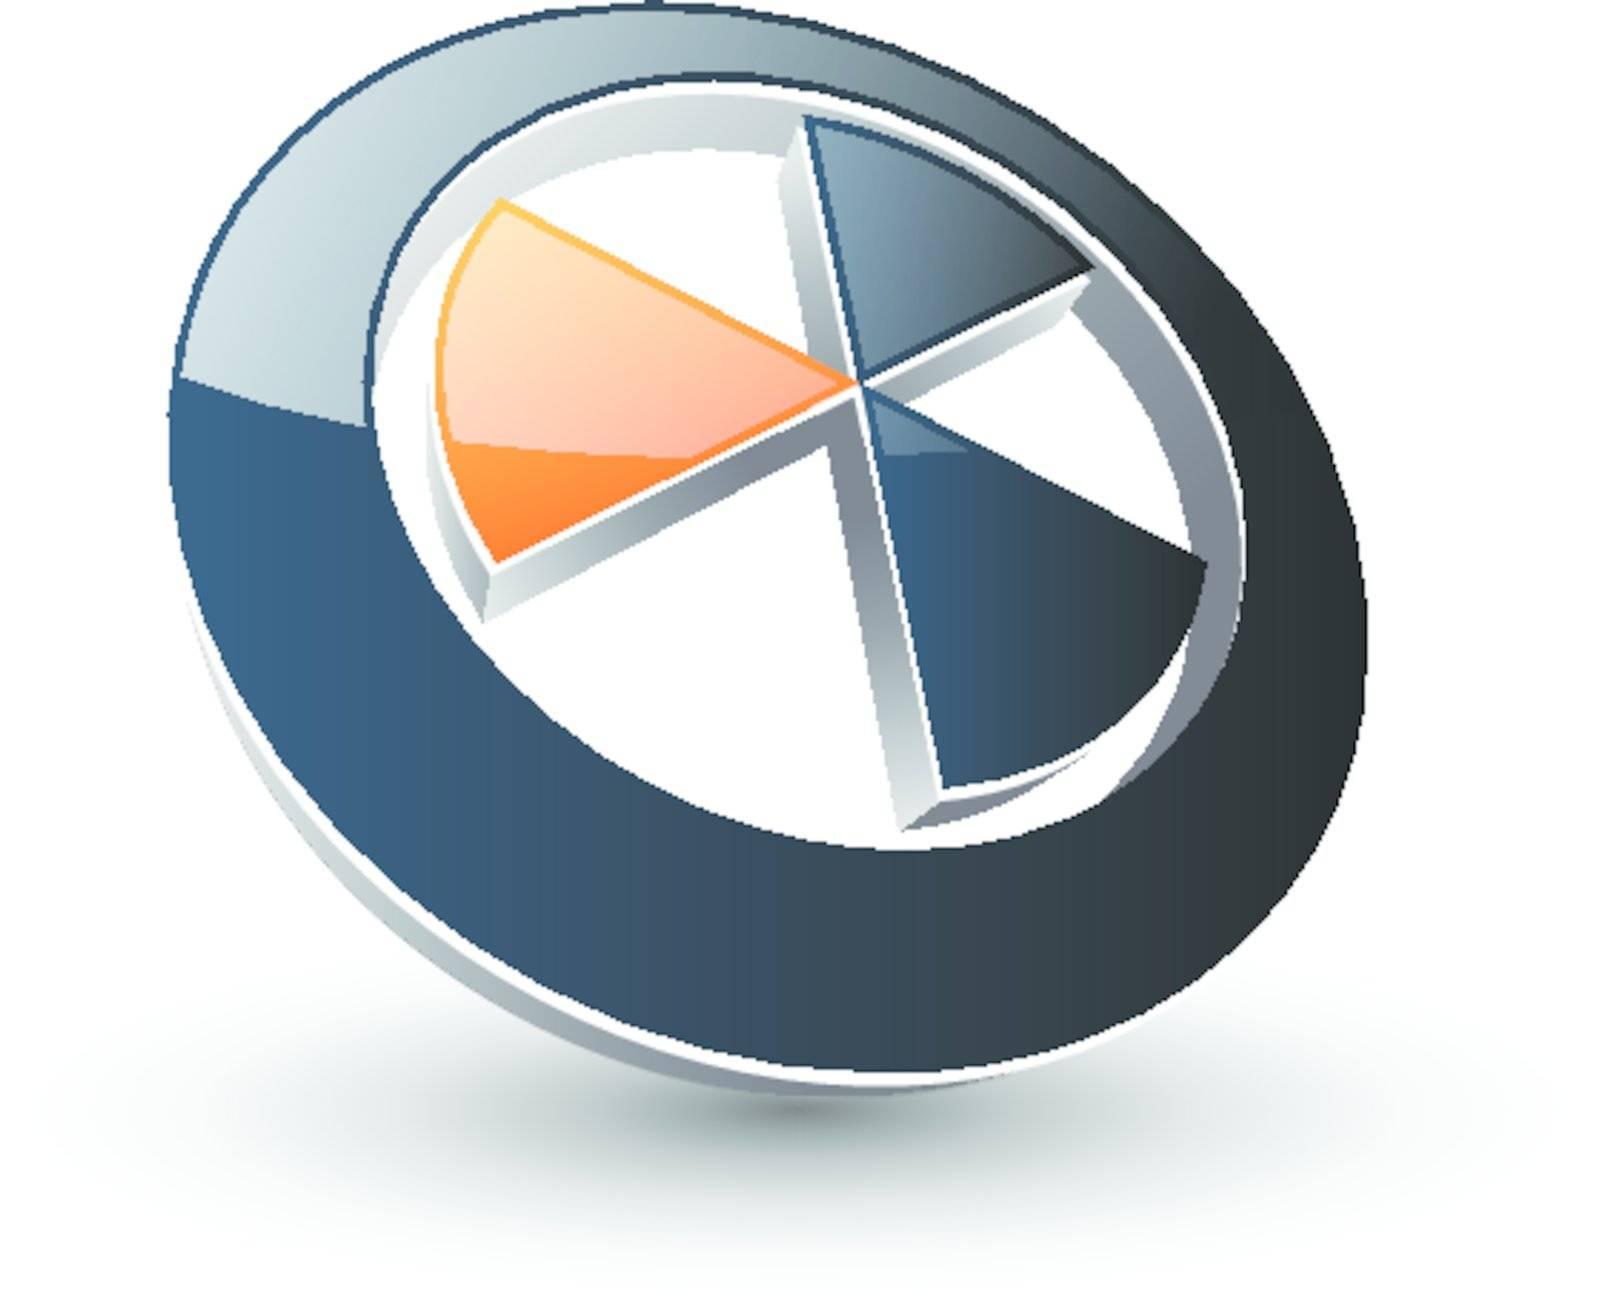 Logo abstract symbol black and orange,vector.